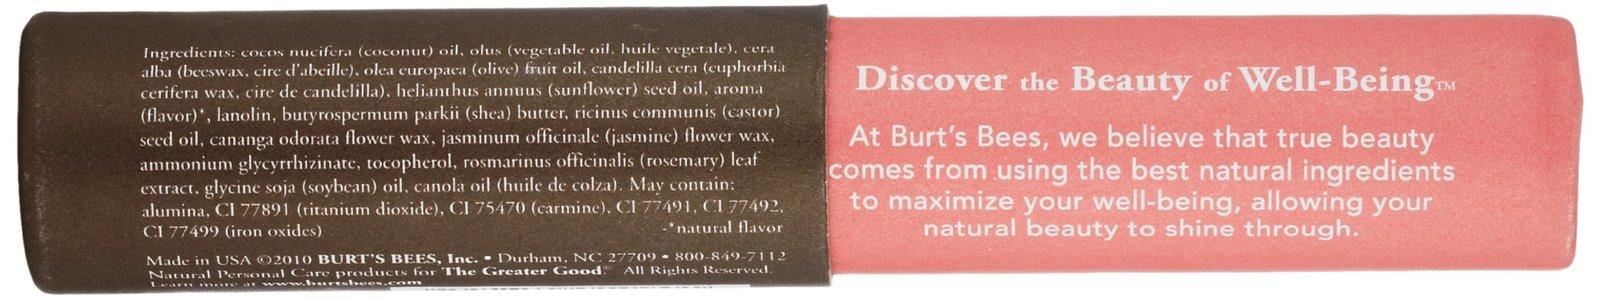 Burt's Bees Tinted Lip Balm, Hibiscus, 0.15 Ounce